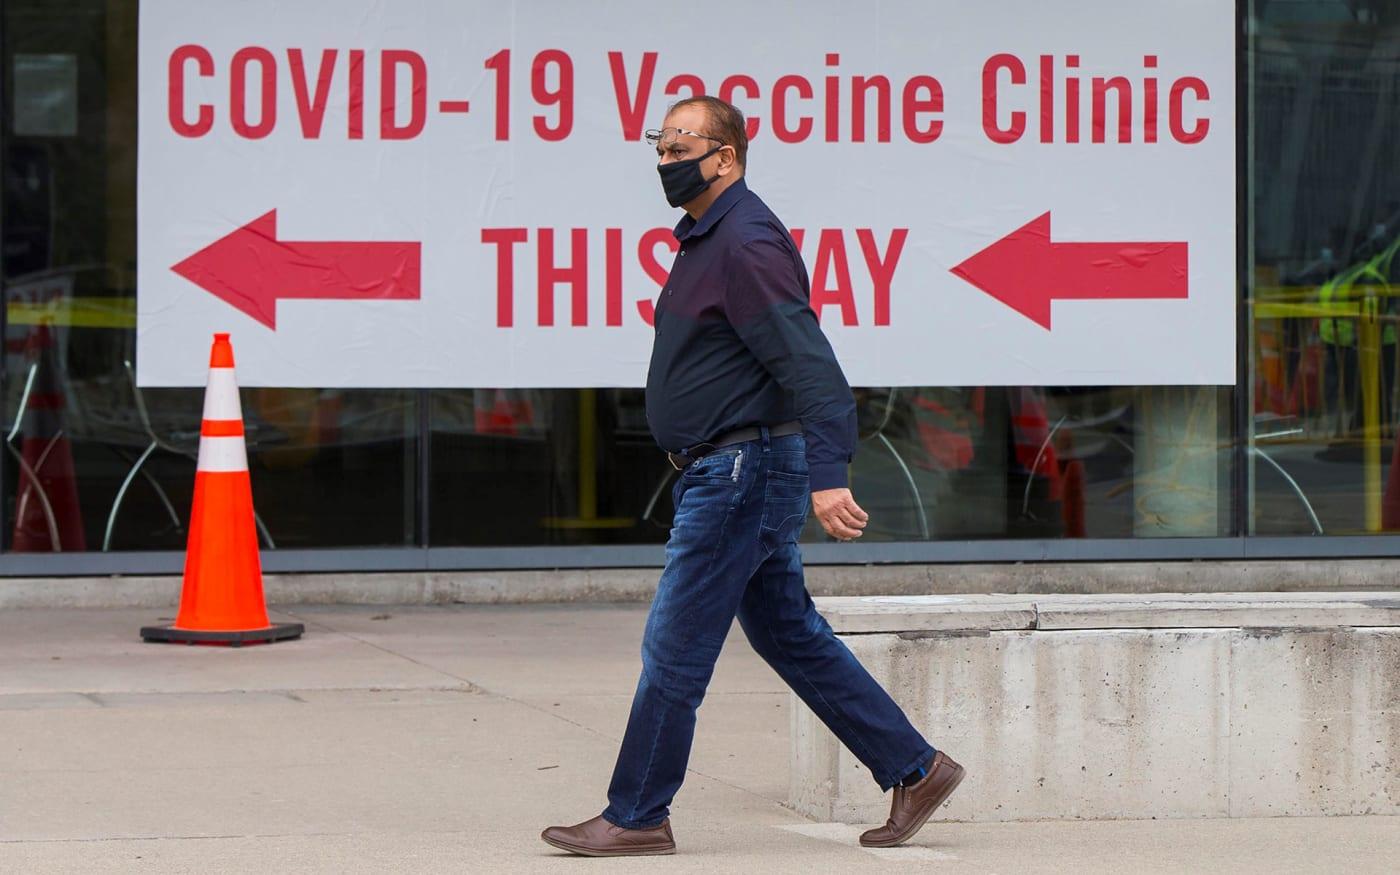 Ontario sitting on 1 million COVID-19 vaccines